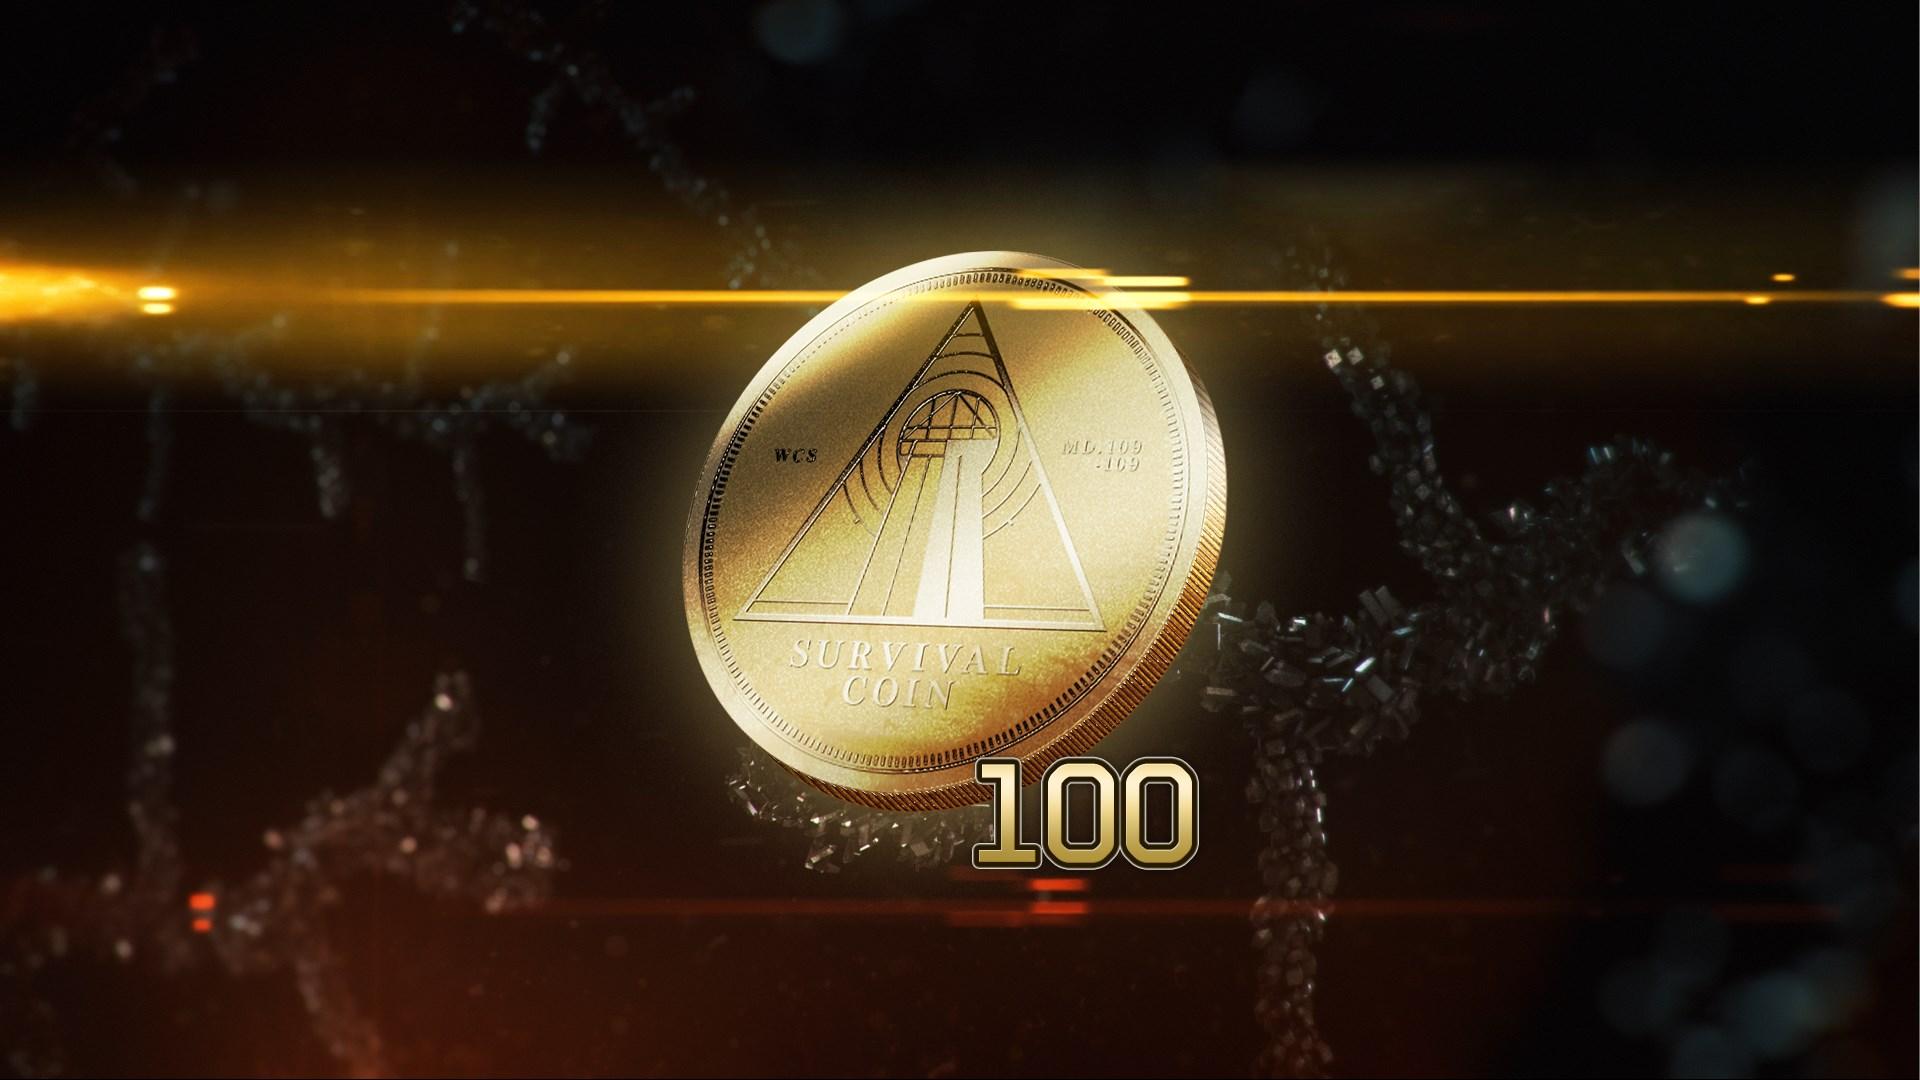 100 SV Coins